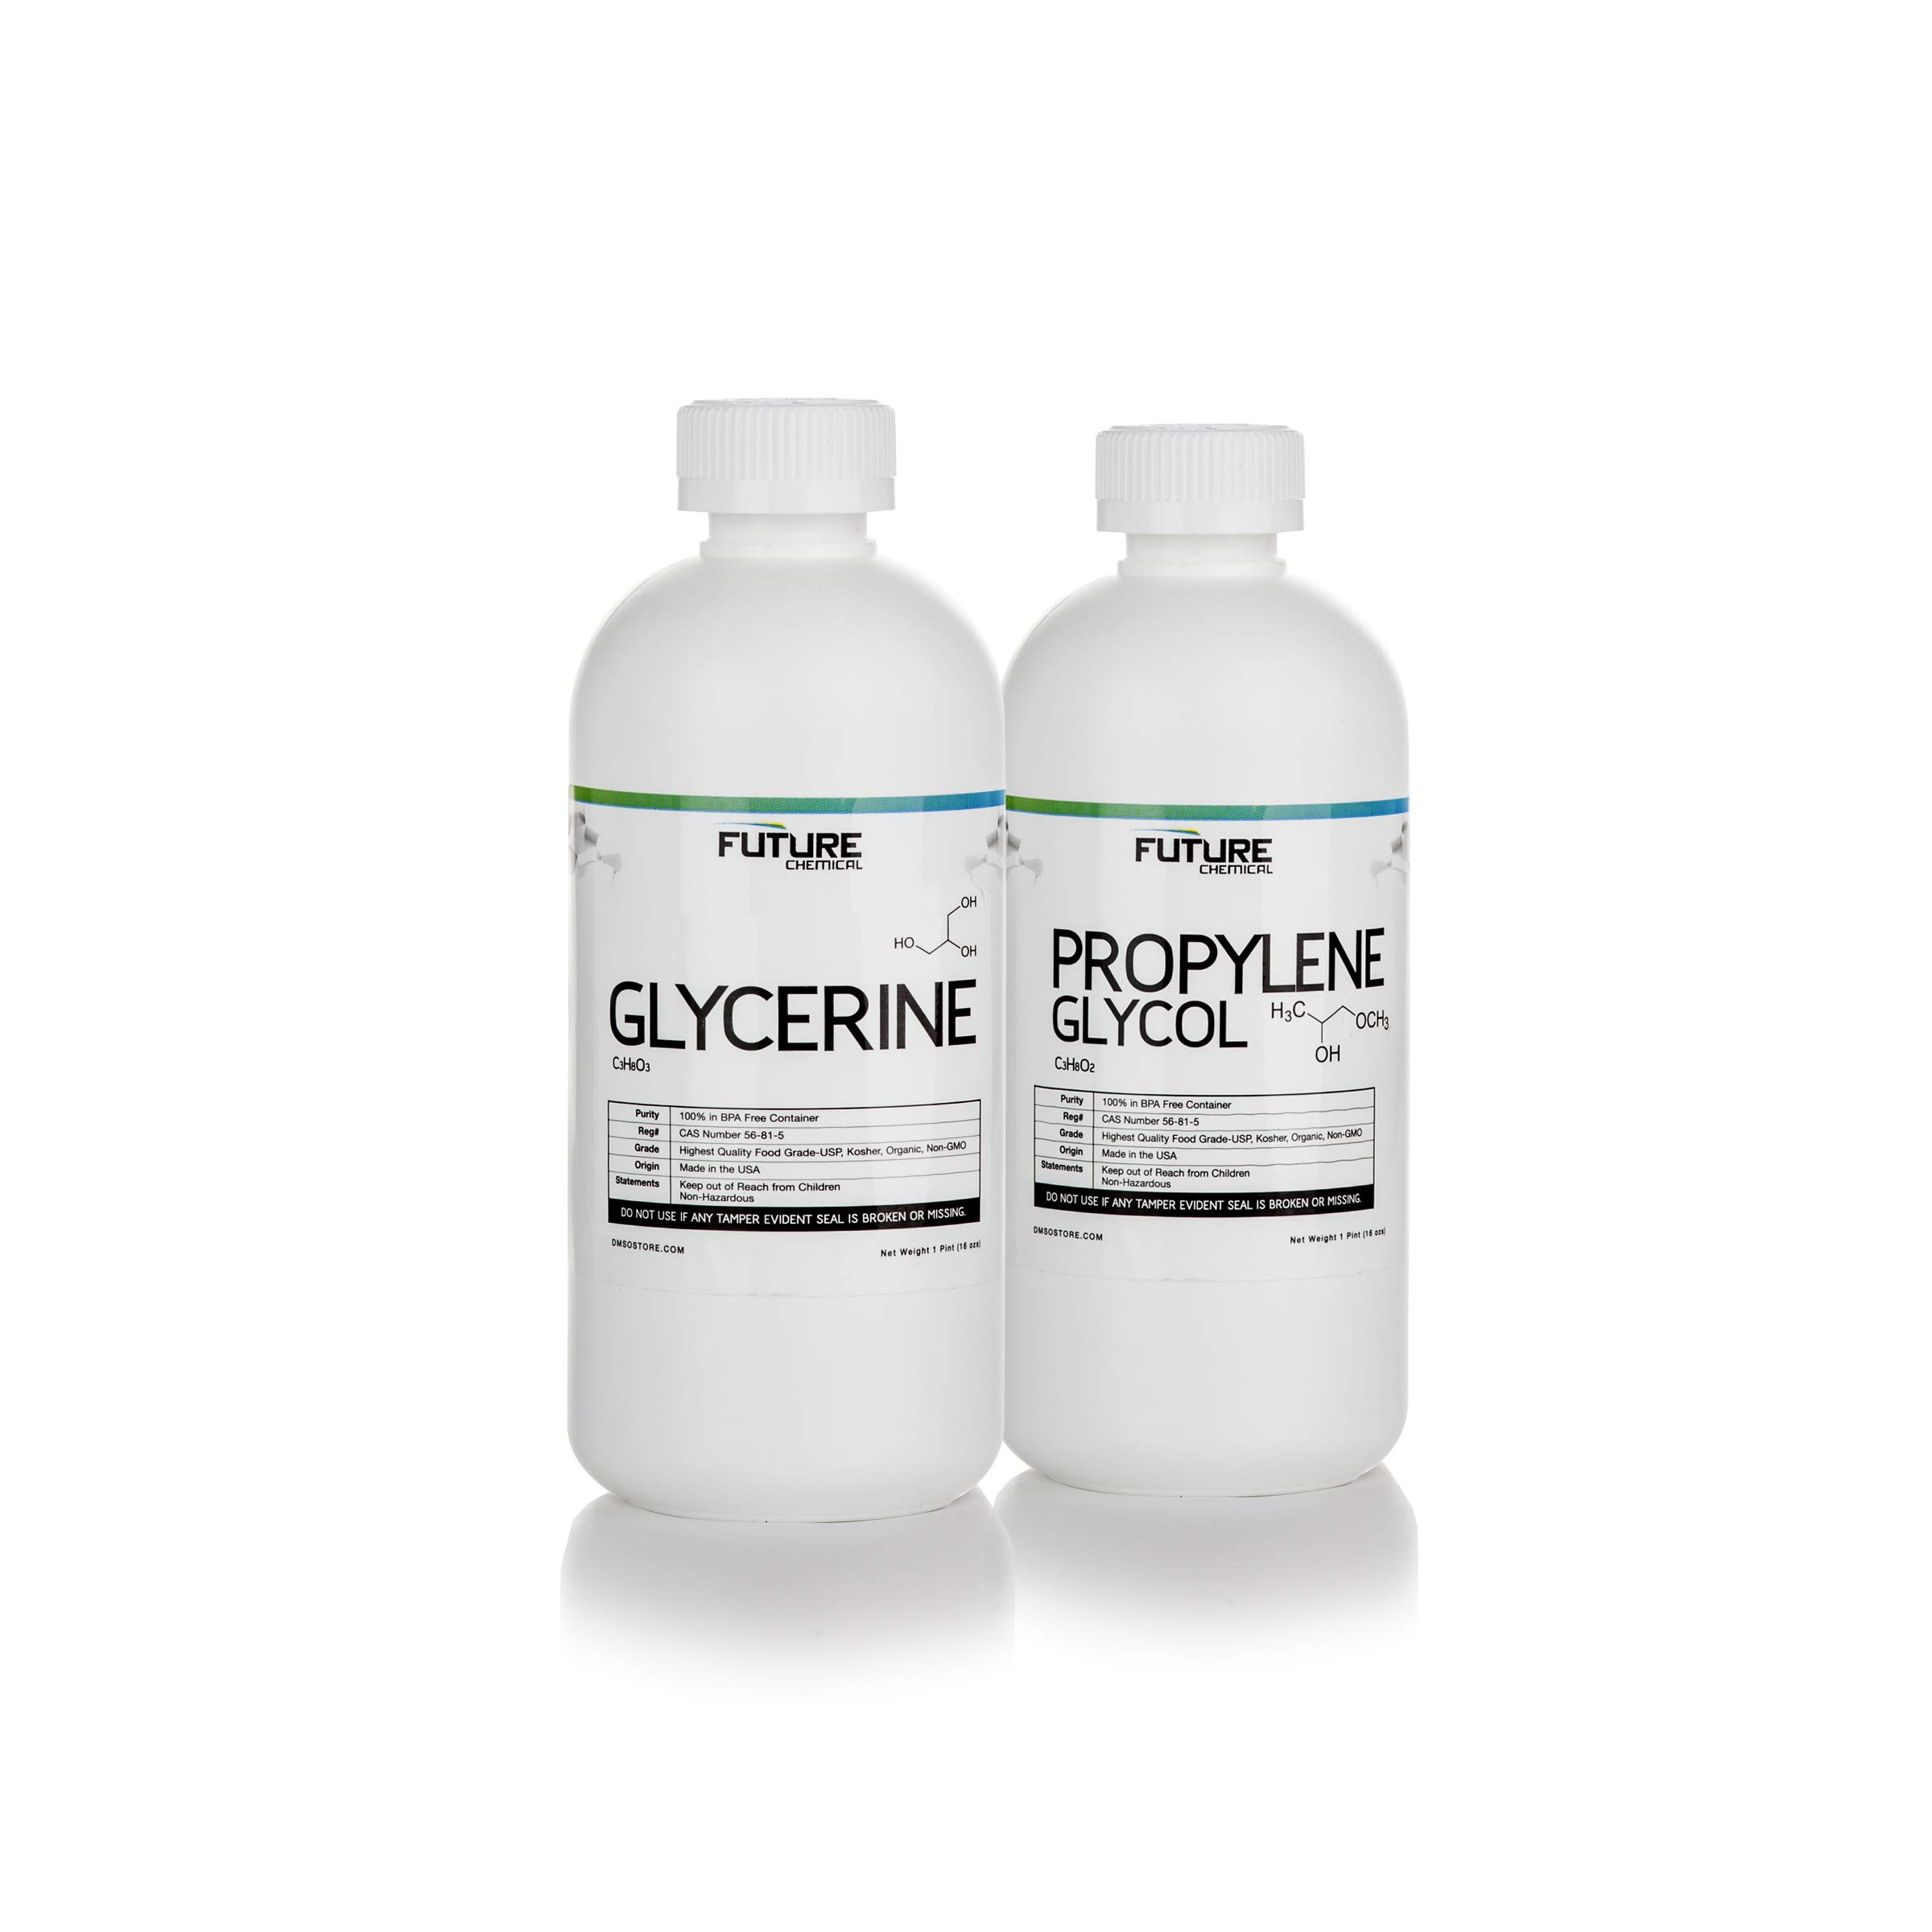 2 Pint Kit - Vegetable Glycerin & Propylene Glycol High Purity Food Grade (16 oz Each)